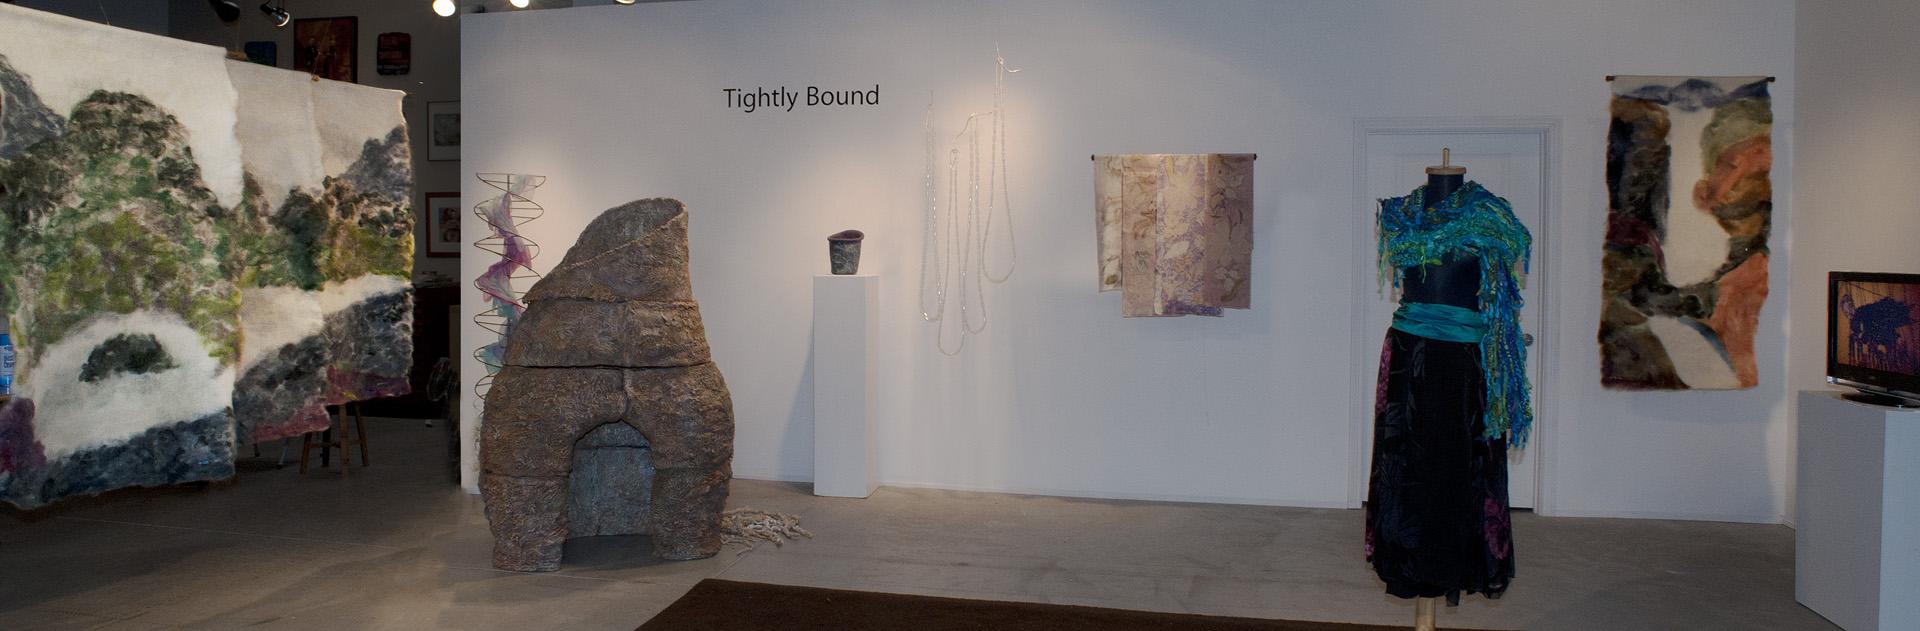 """Tightly Bound""-"